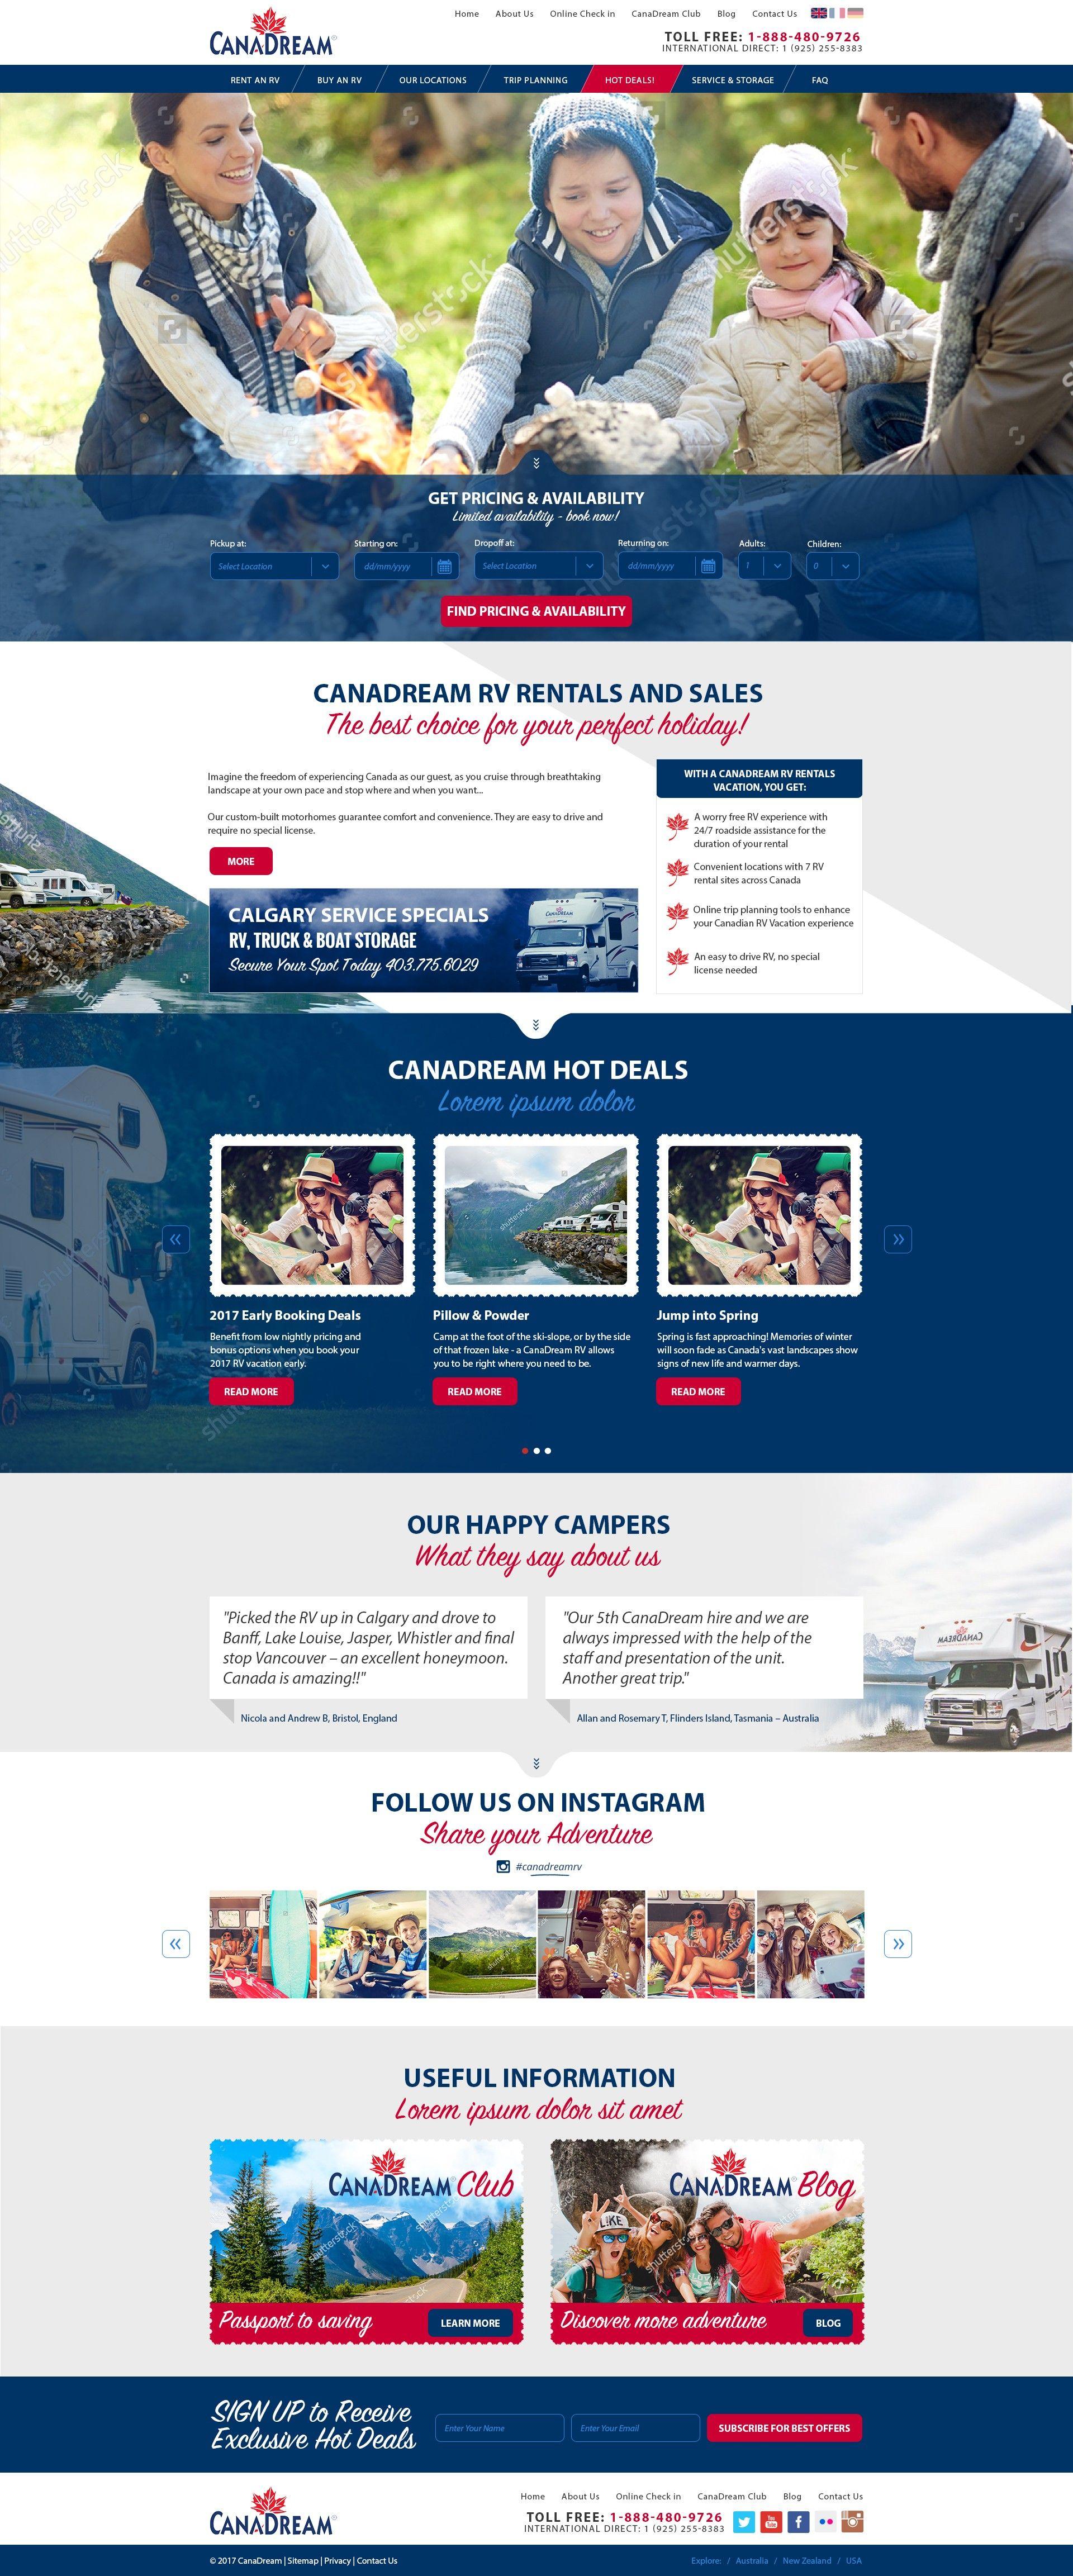 Canadian Tourism Website 99designs Wordpress Web Design Tourism Website Web Design